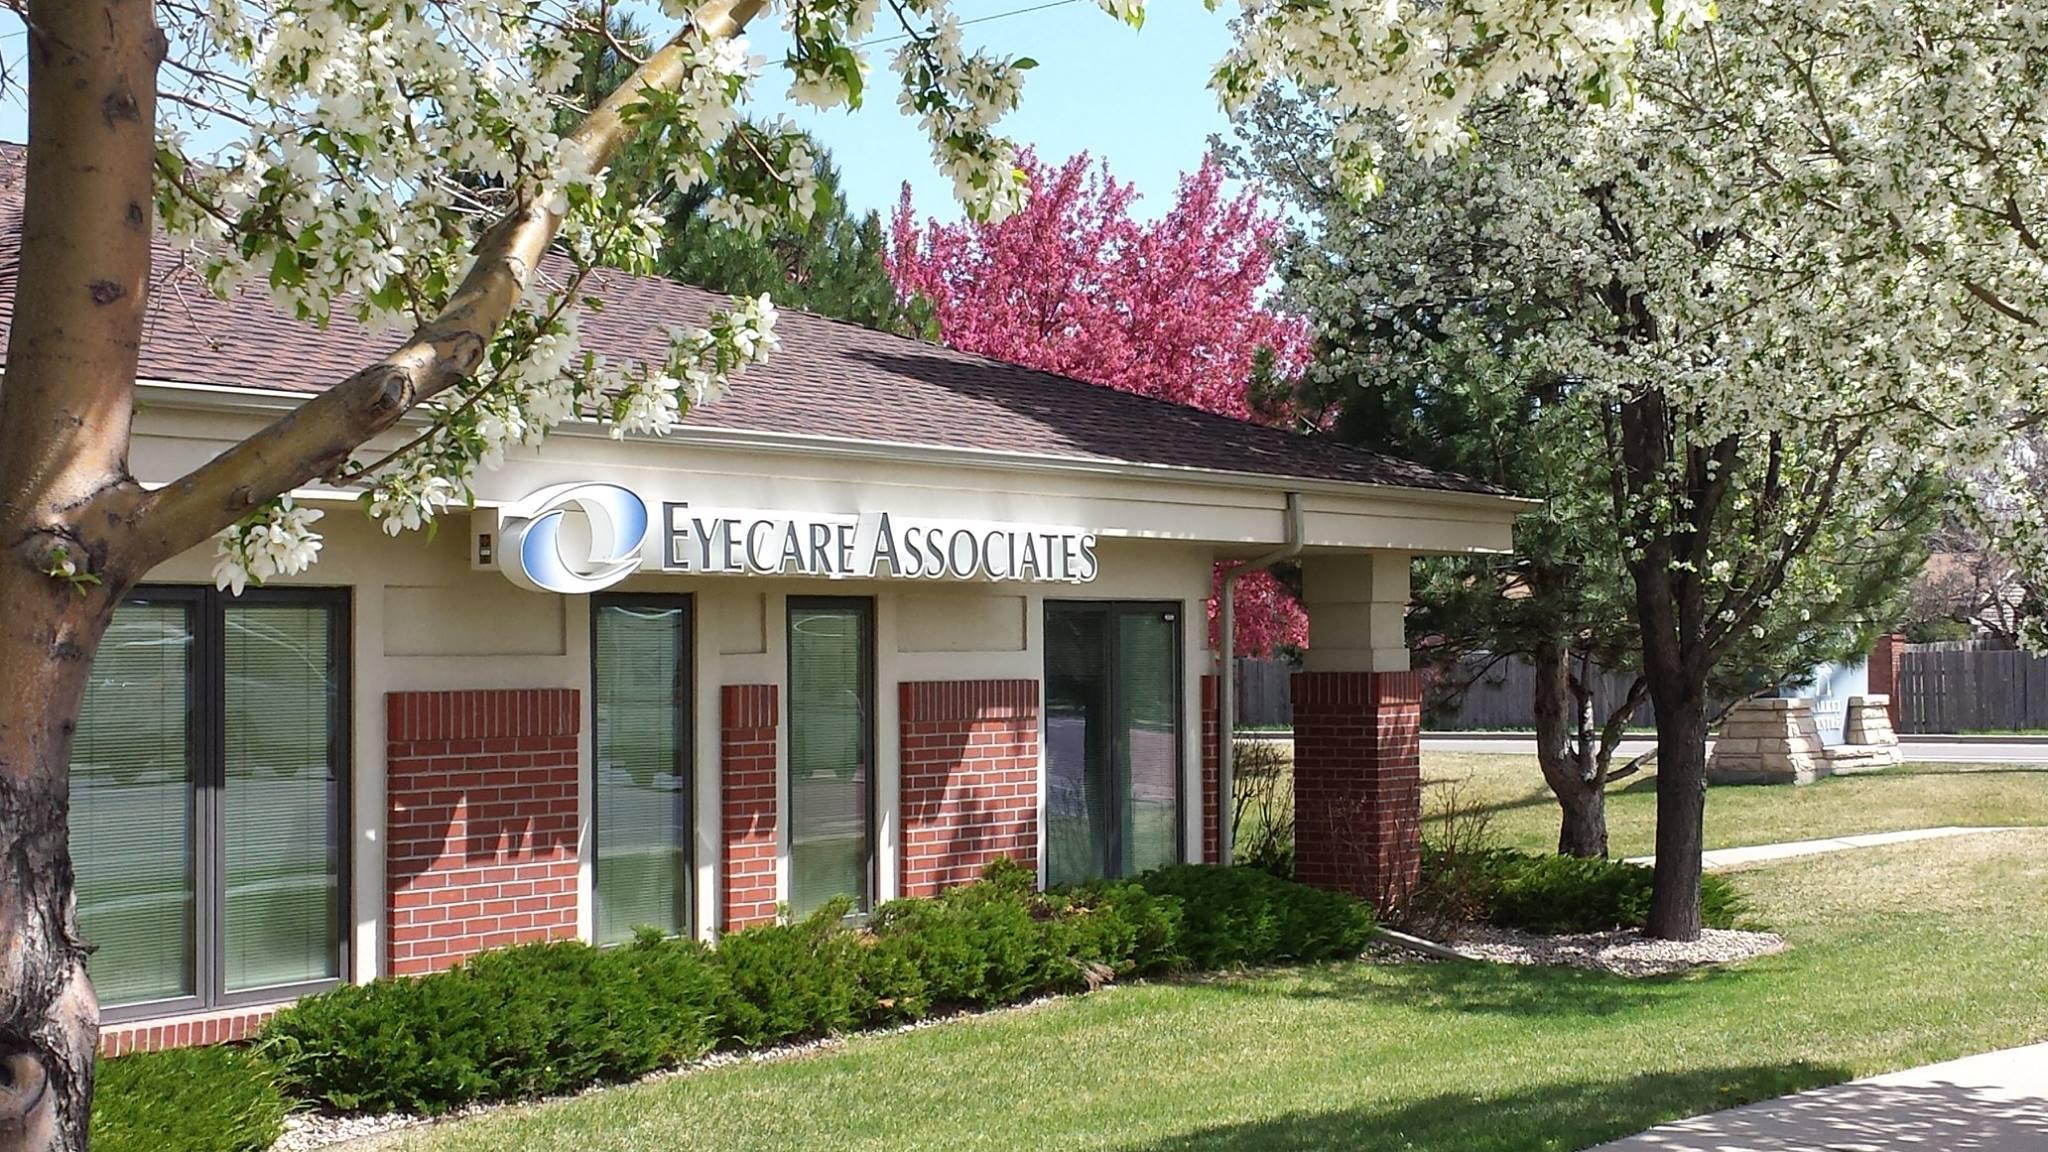 Optometrists at Eyecare Associates in Windsor,CO